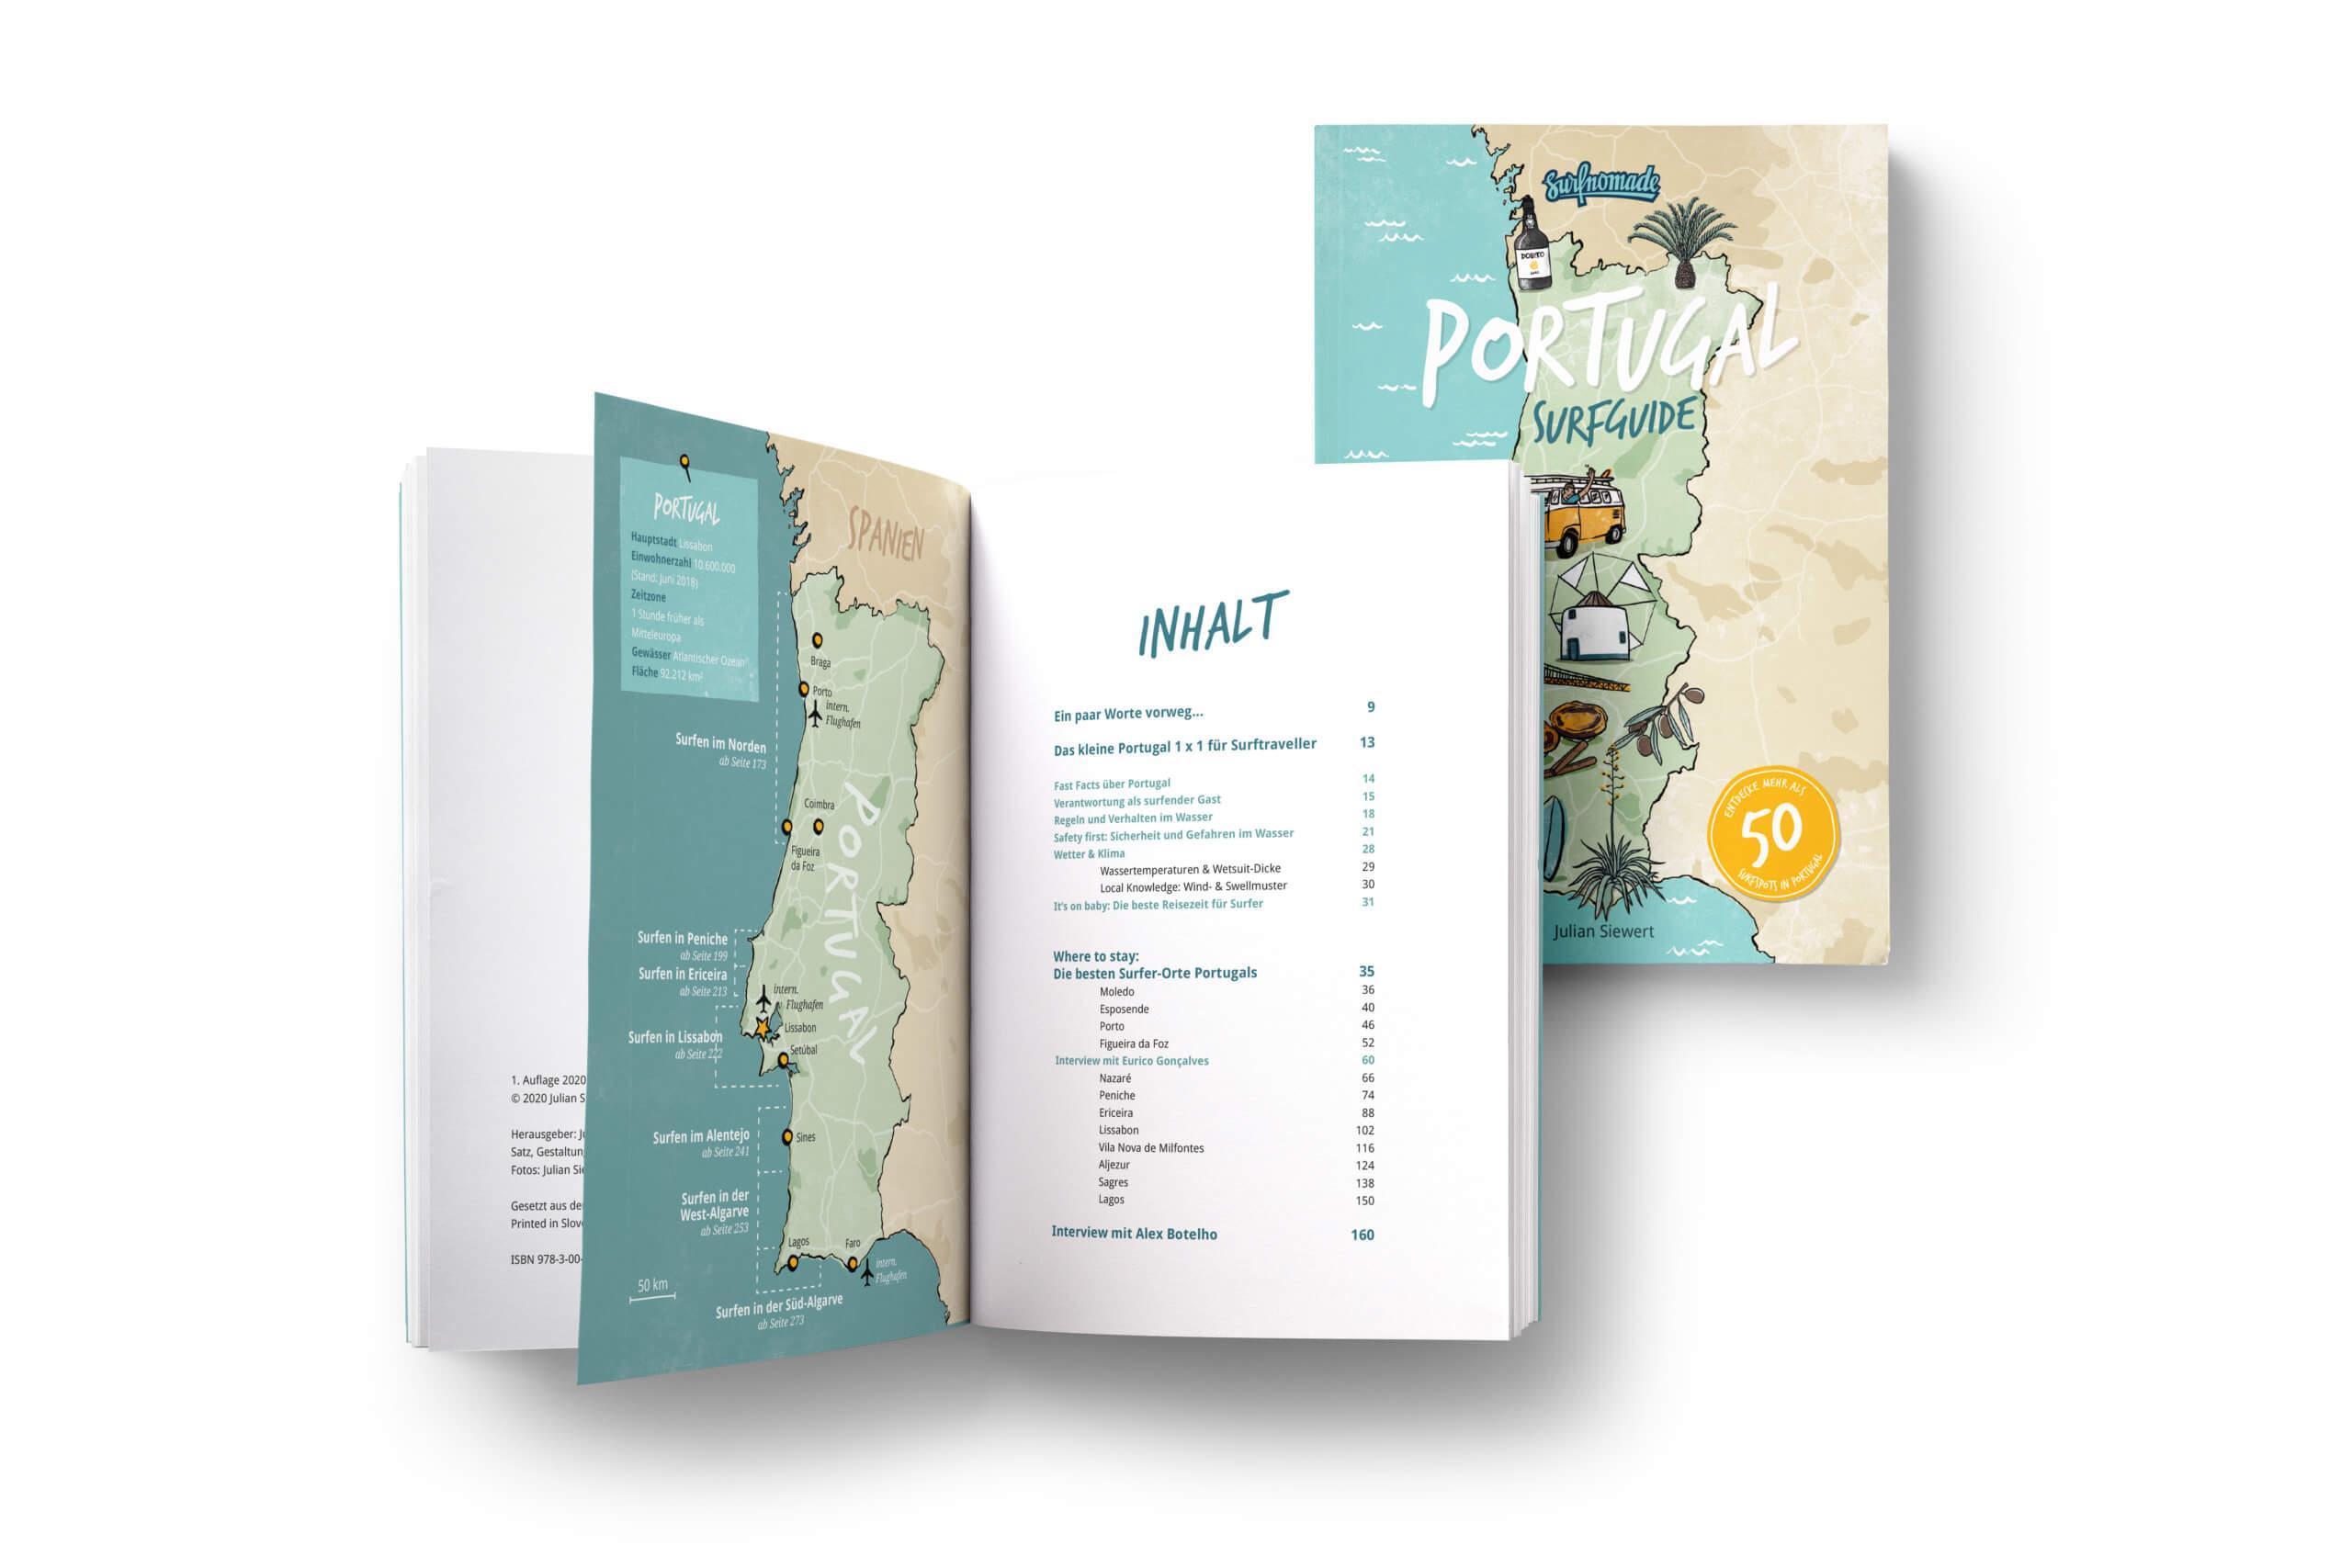 Surfguide Portugal 2020